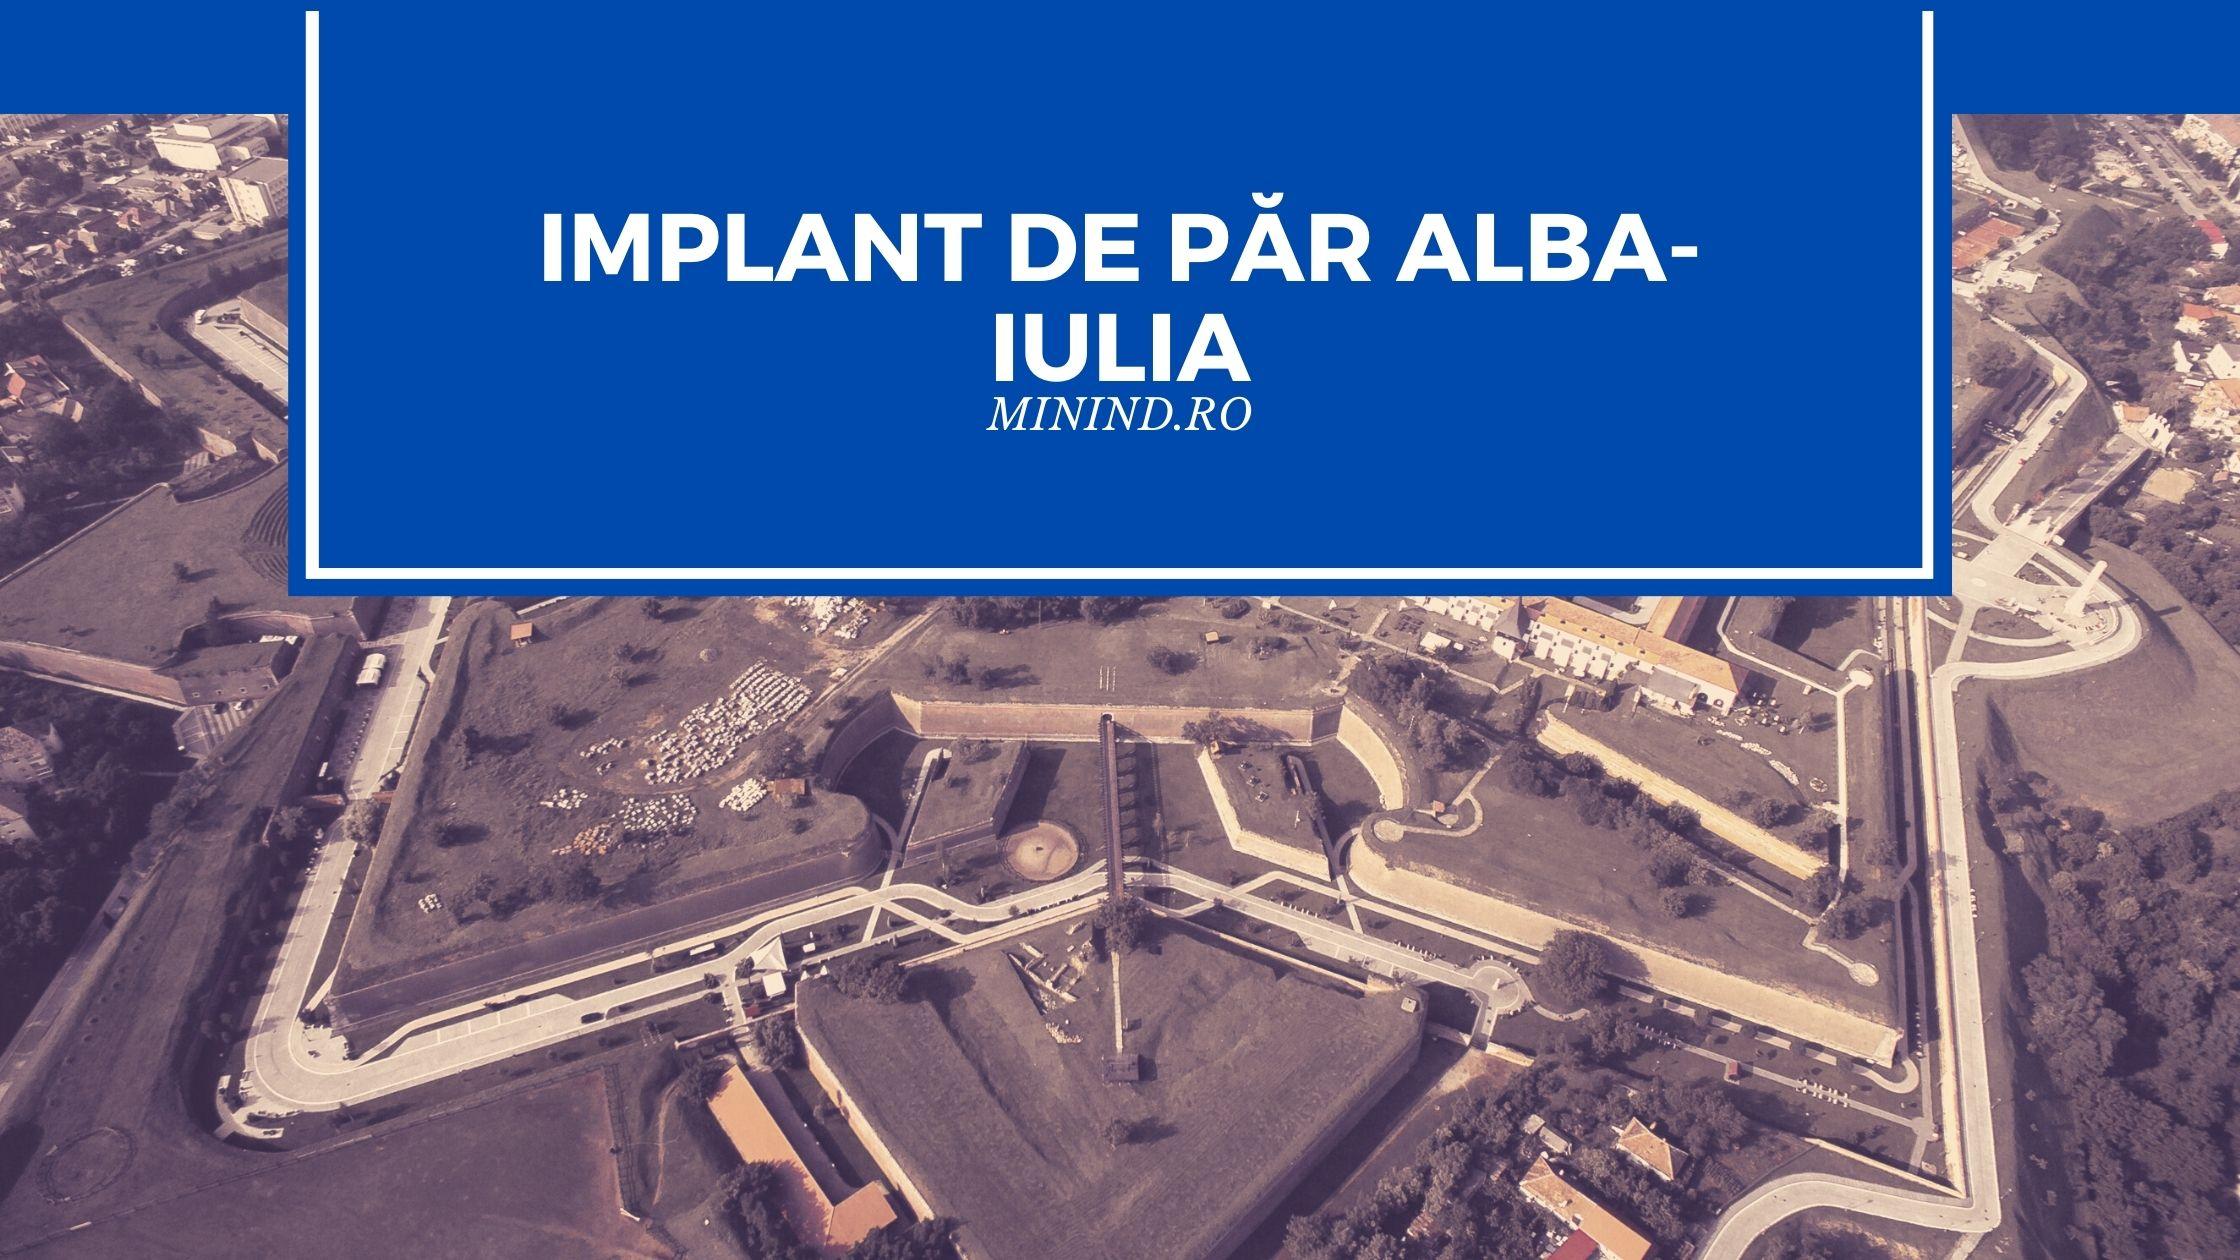 implant de par alba iulia